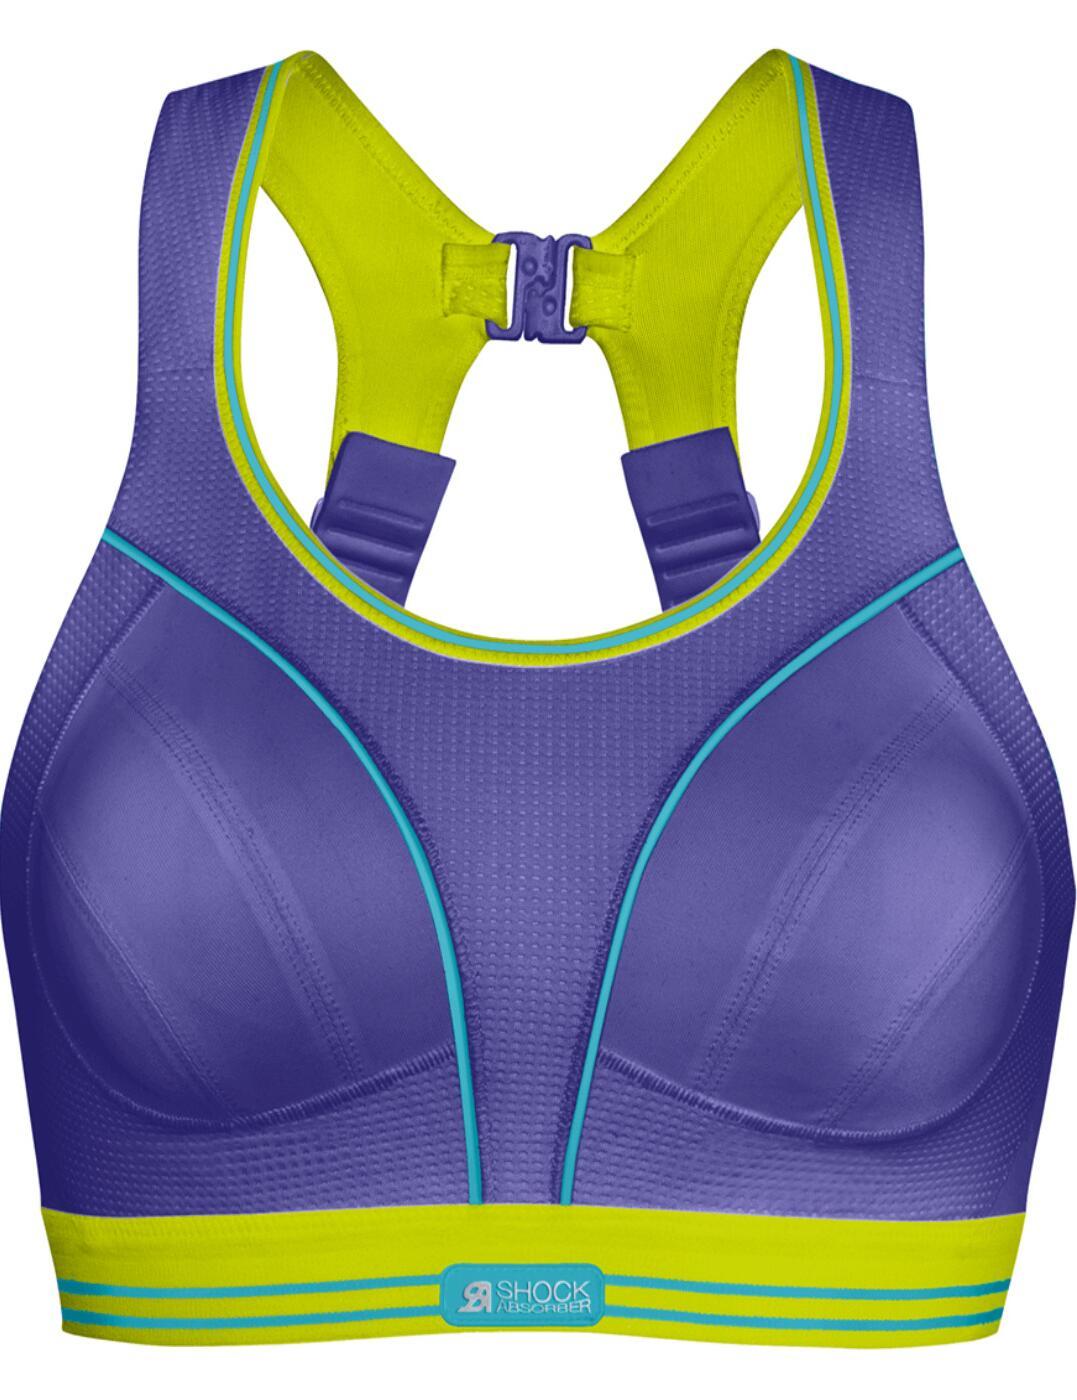 Shock-Absorber-High-Impact-Run-Sports-Bra-S5044-Womens-Running-Sports-Bras thumbnail 5